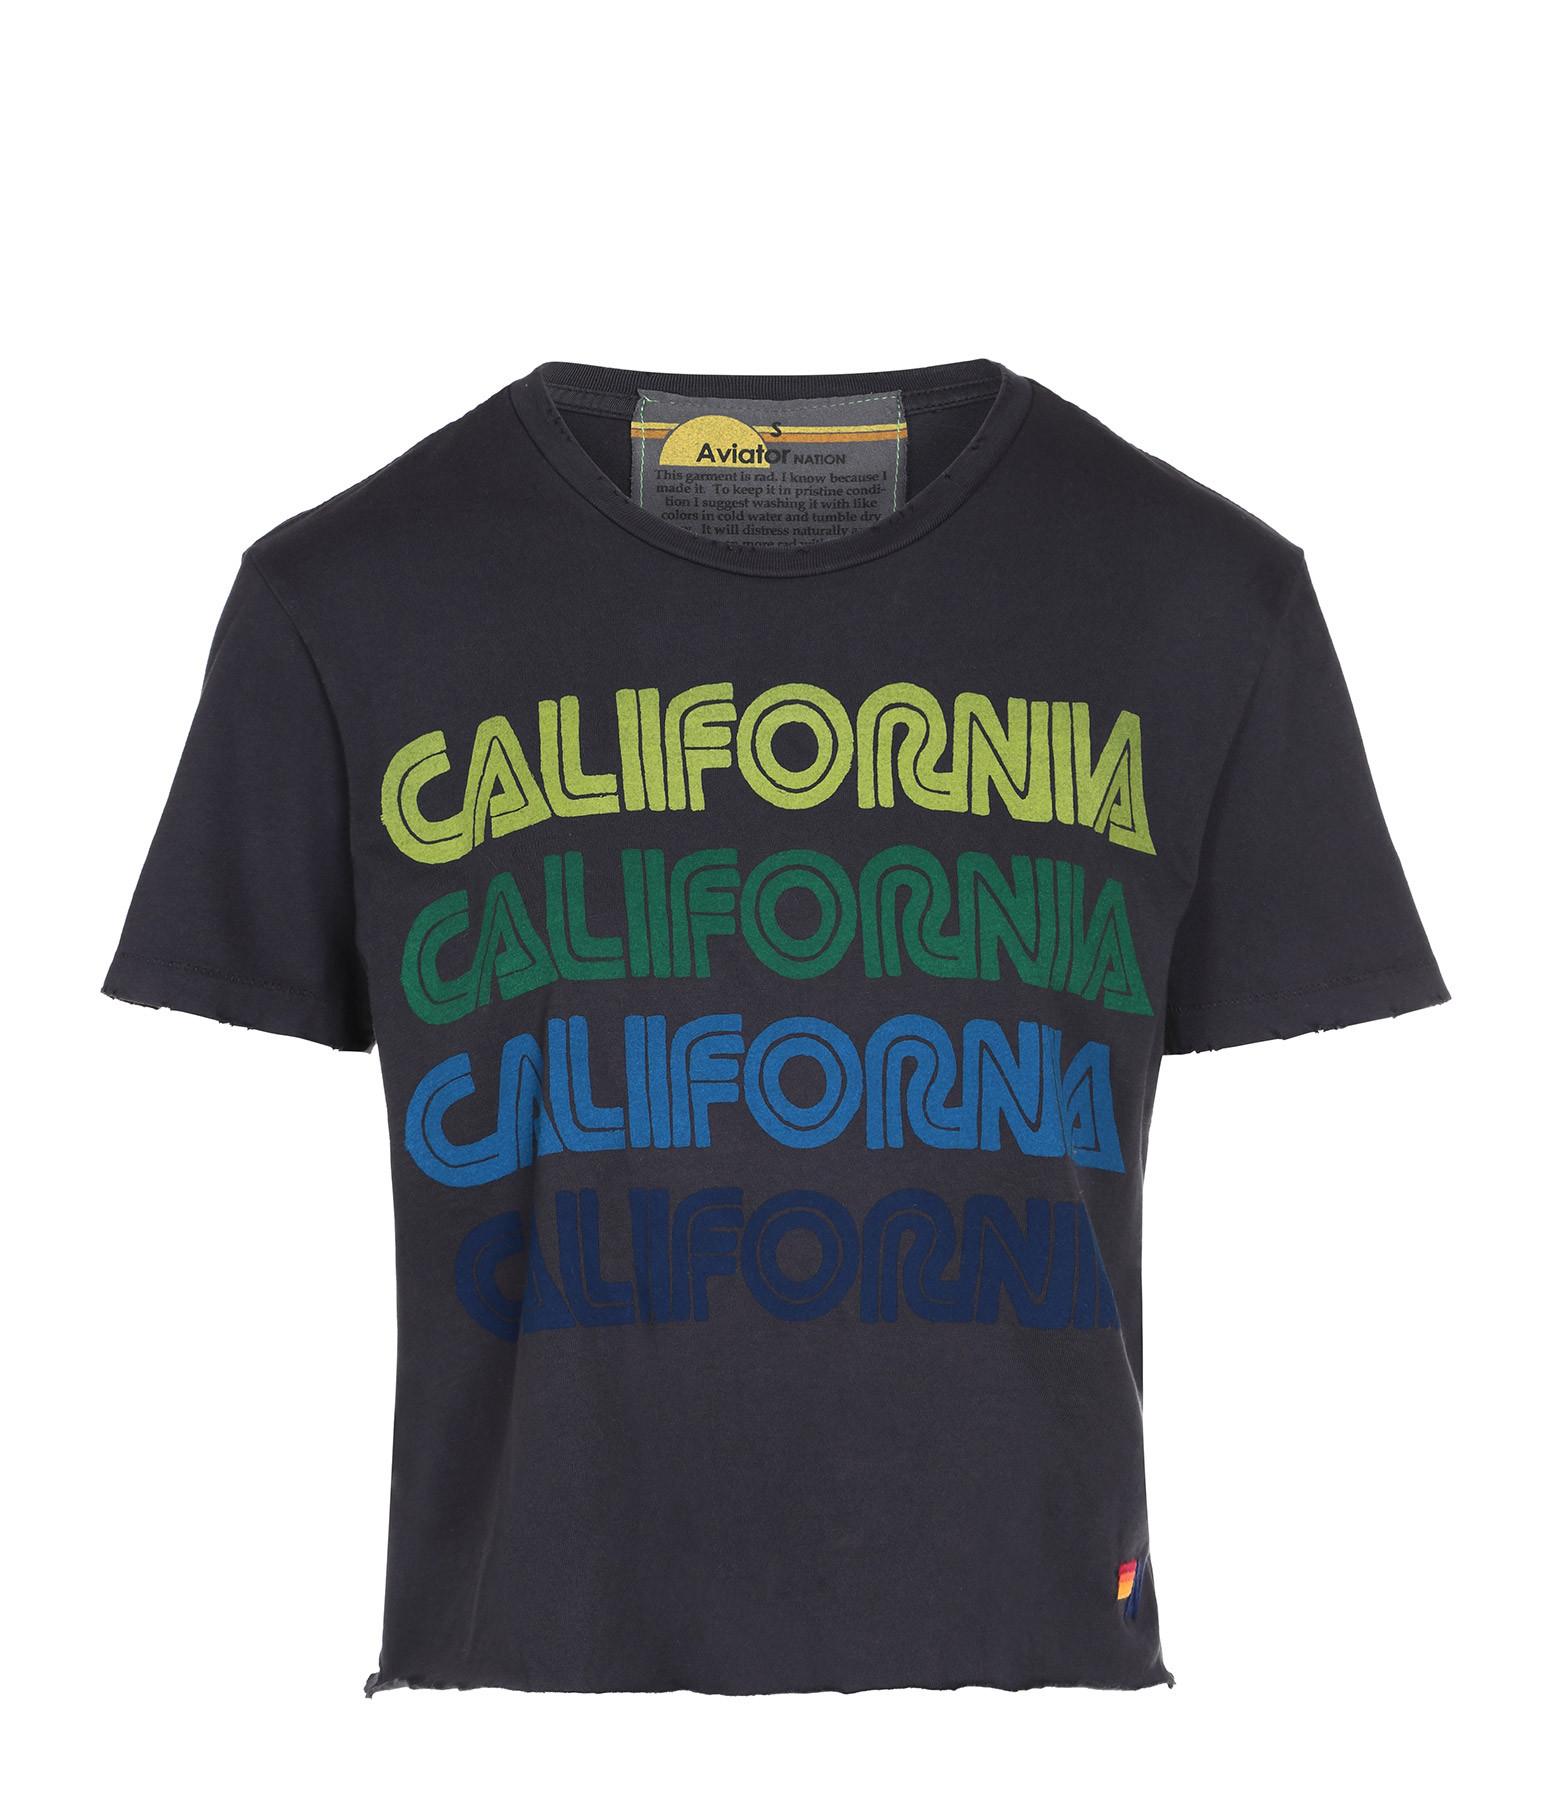 AVIATOR NATION - Tee-shirt California Repeat Charbon